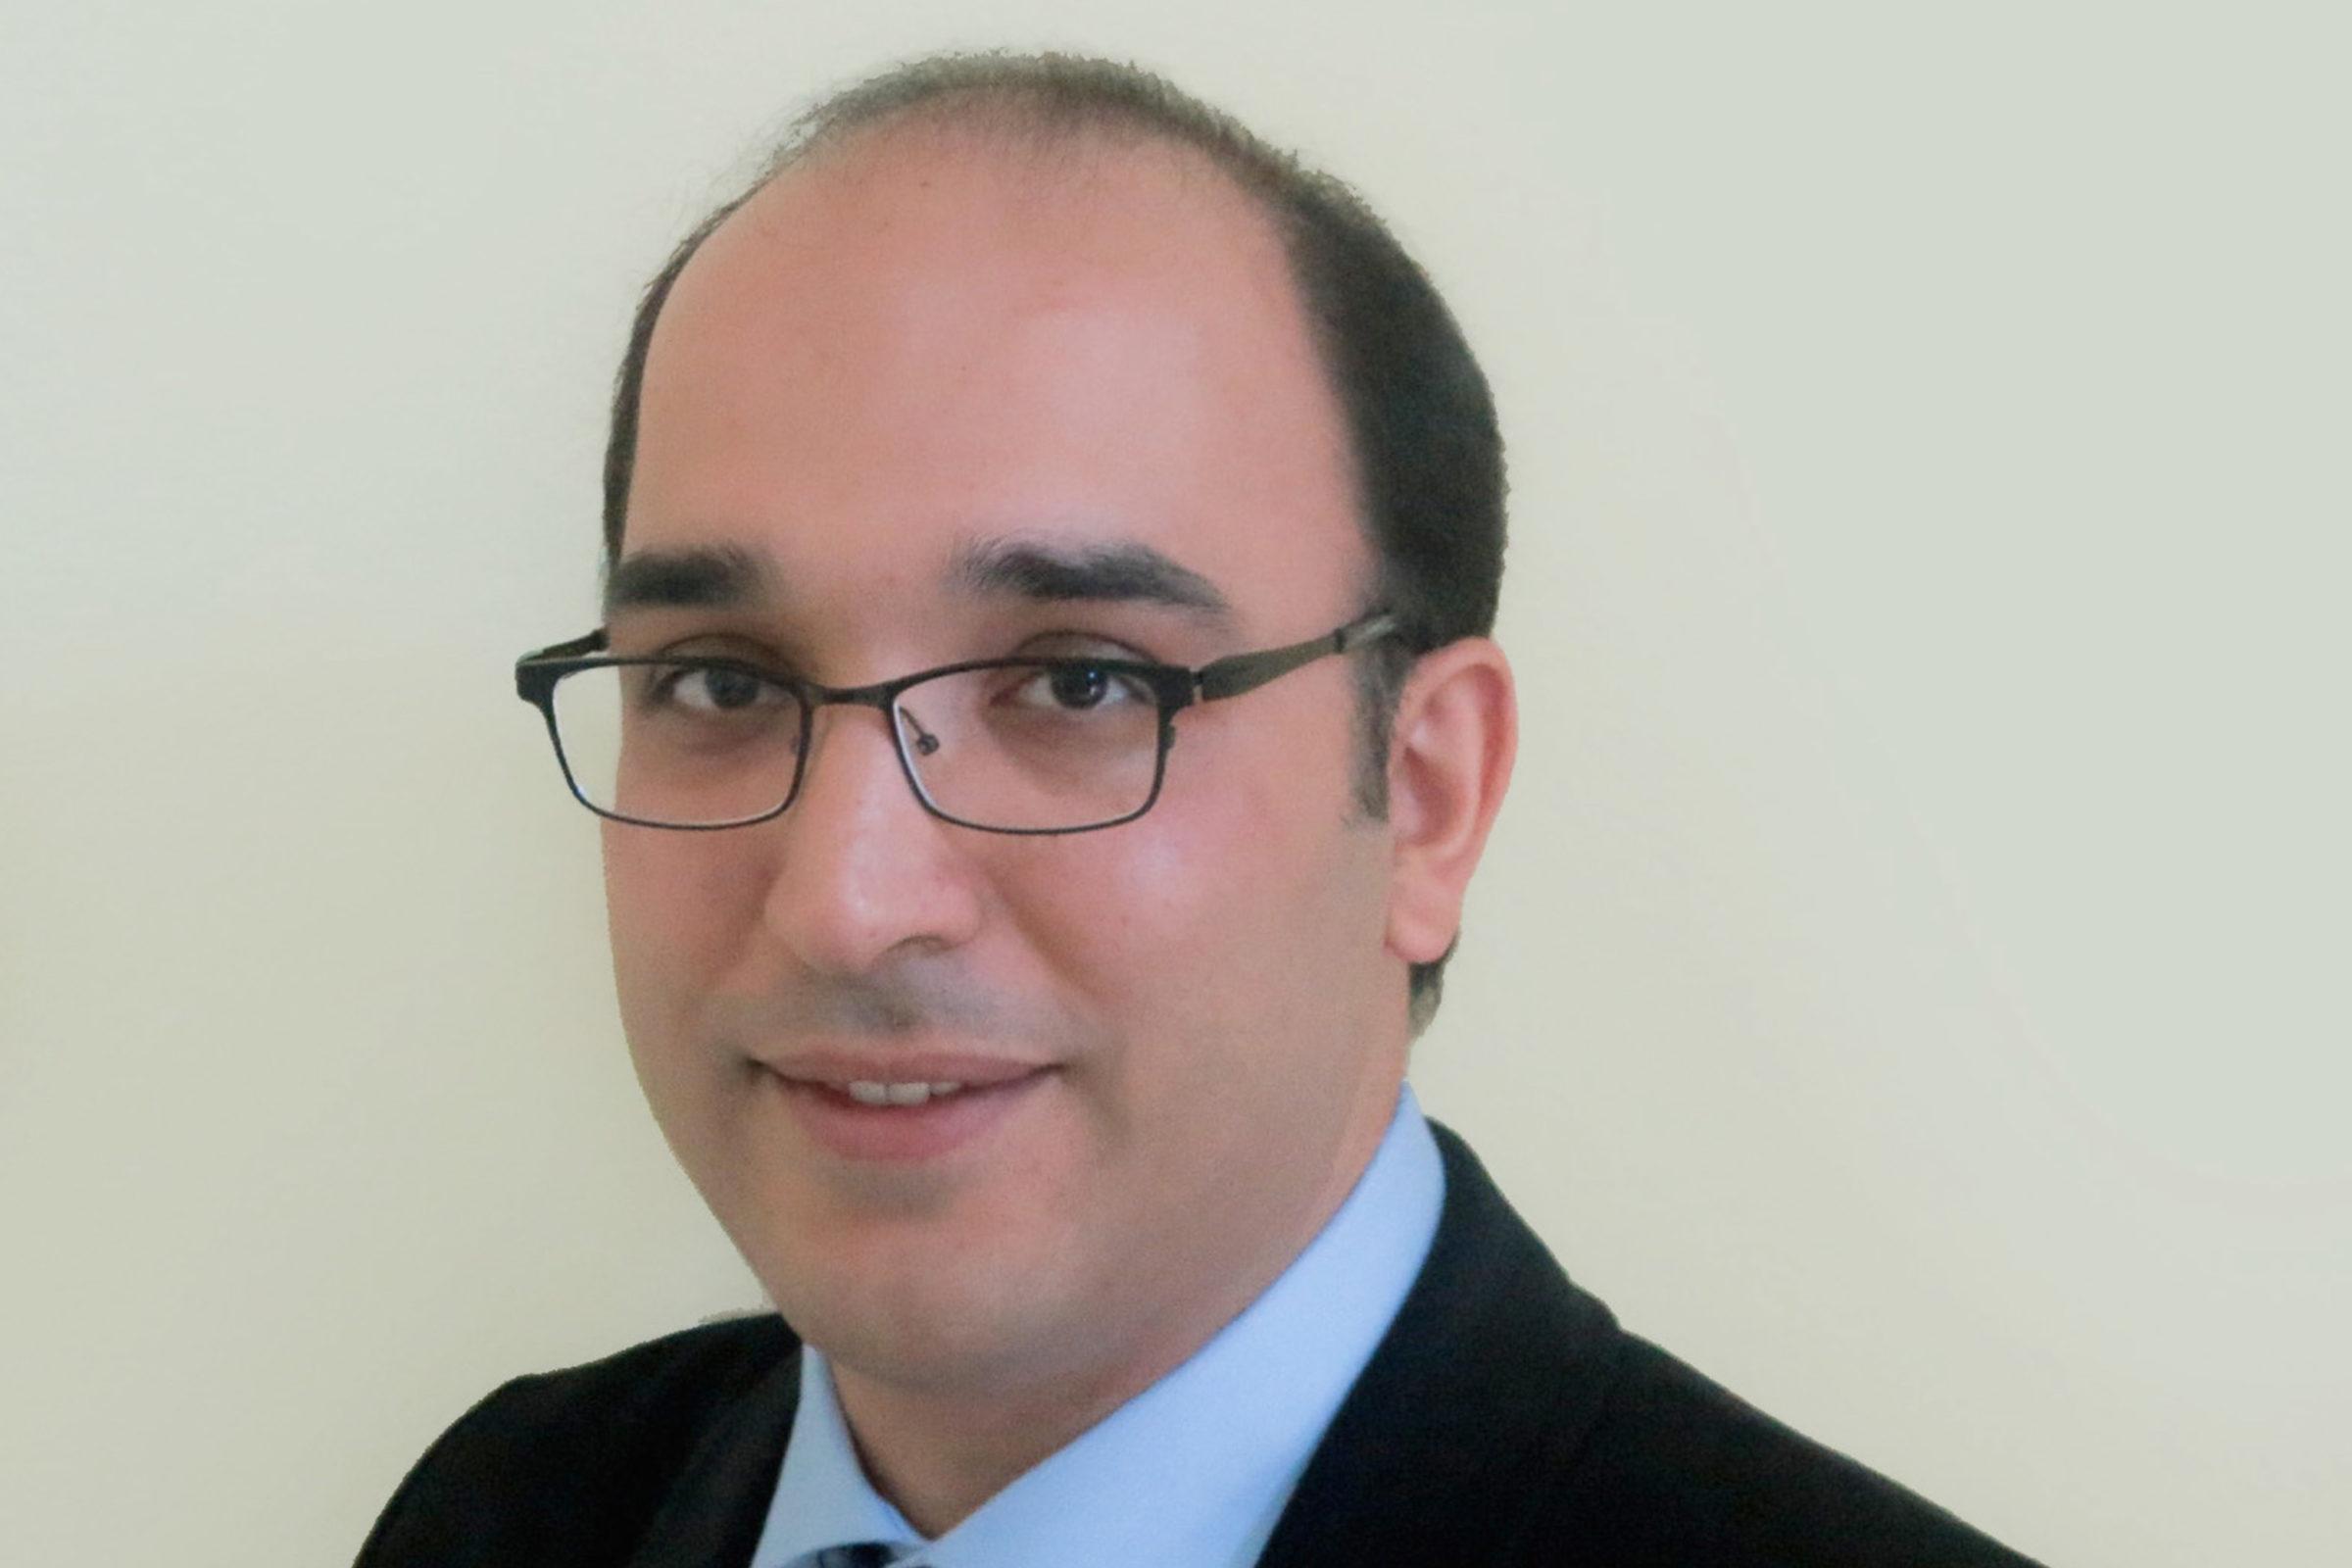 Hessam Mahdavifar